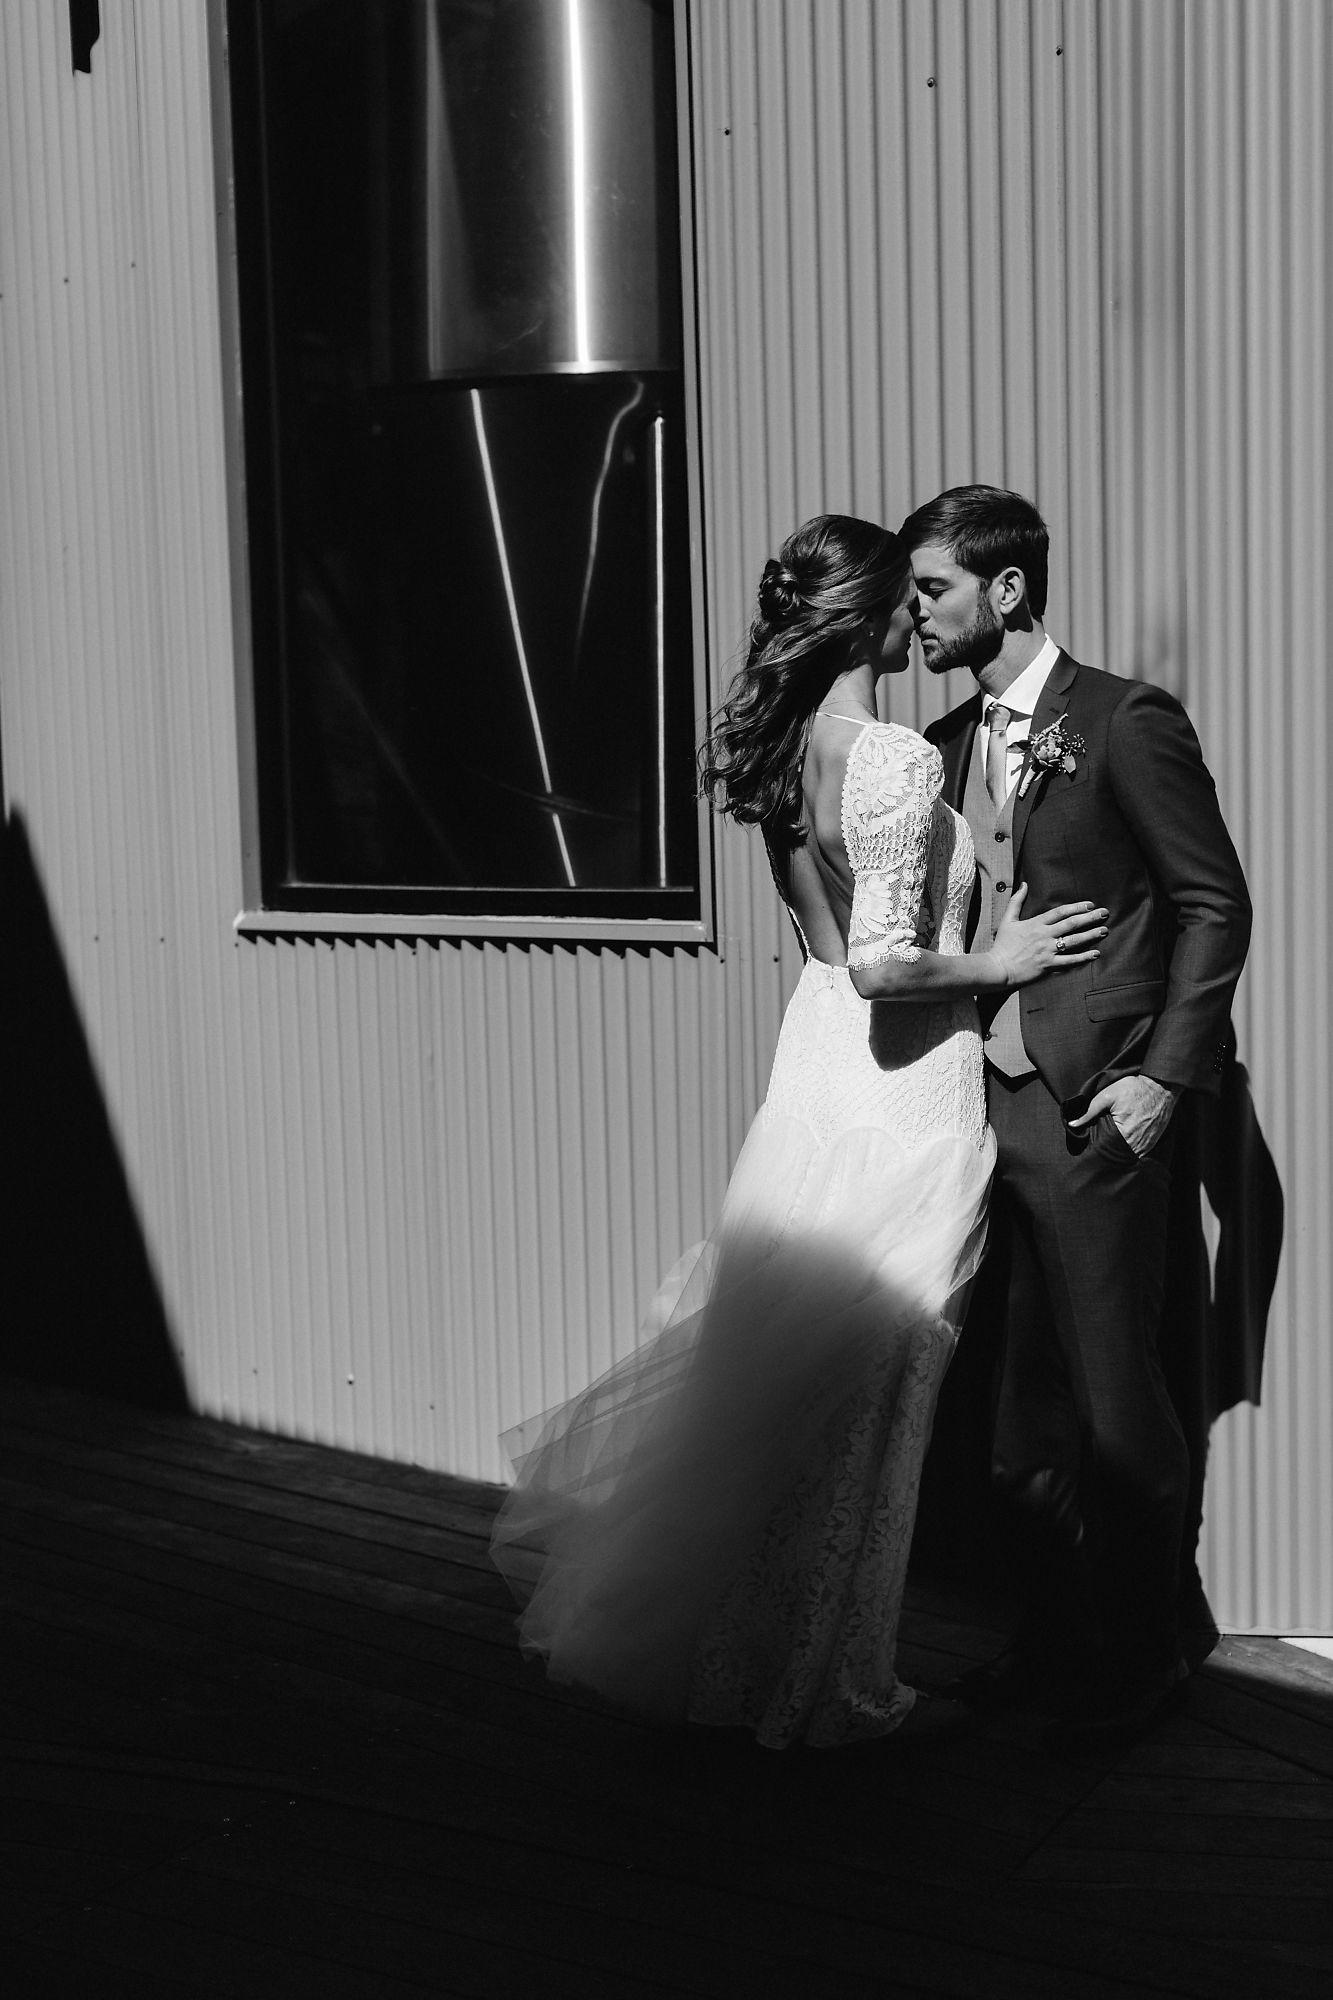 jessica_austin_oasis_brewery_wedding_photos135431.jpg